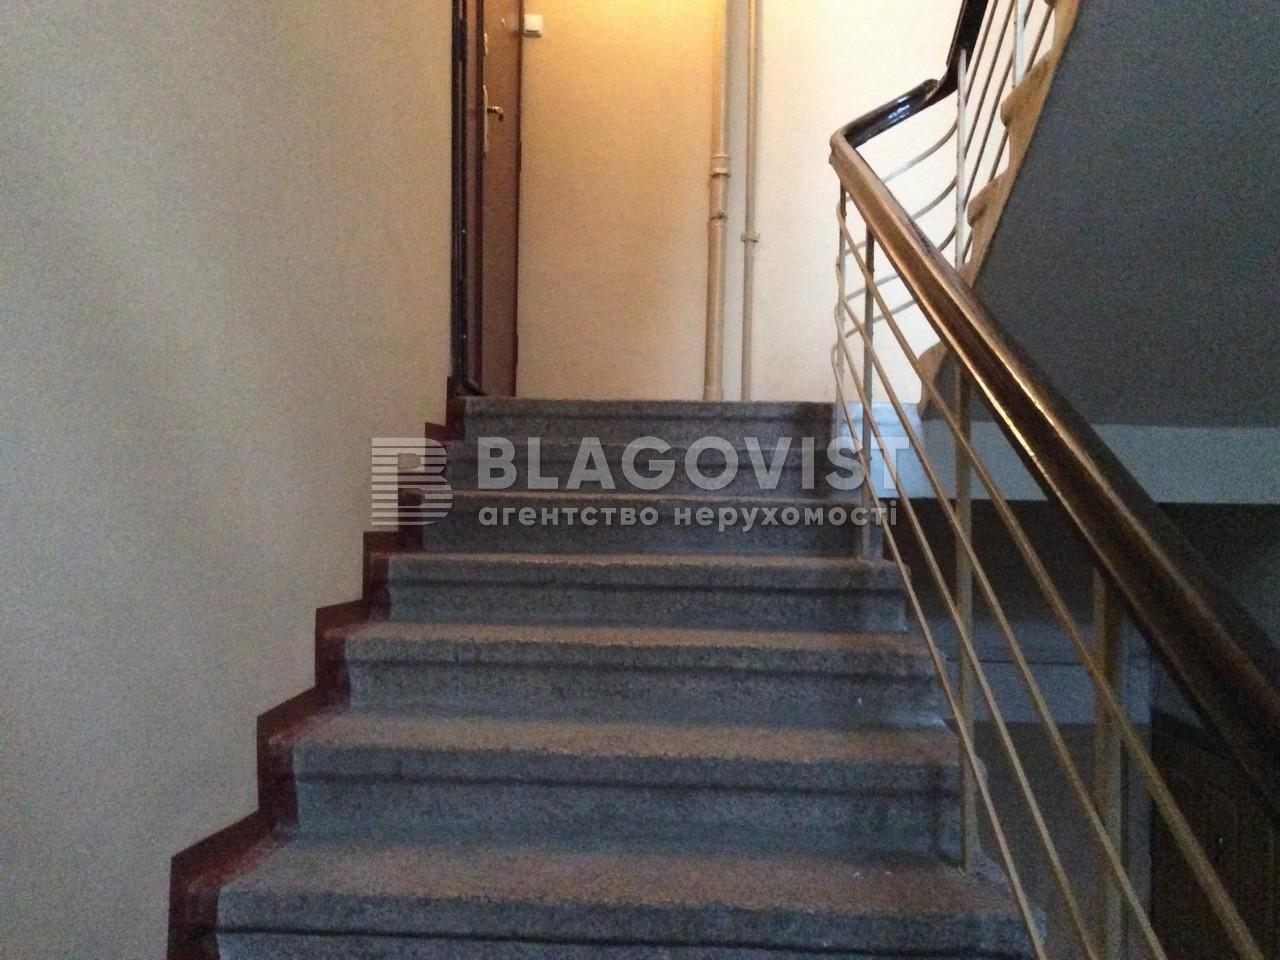 Квартира R-4344, Богомольца Академика, 2, Киев - Фото 20